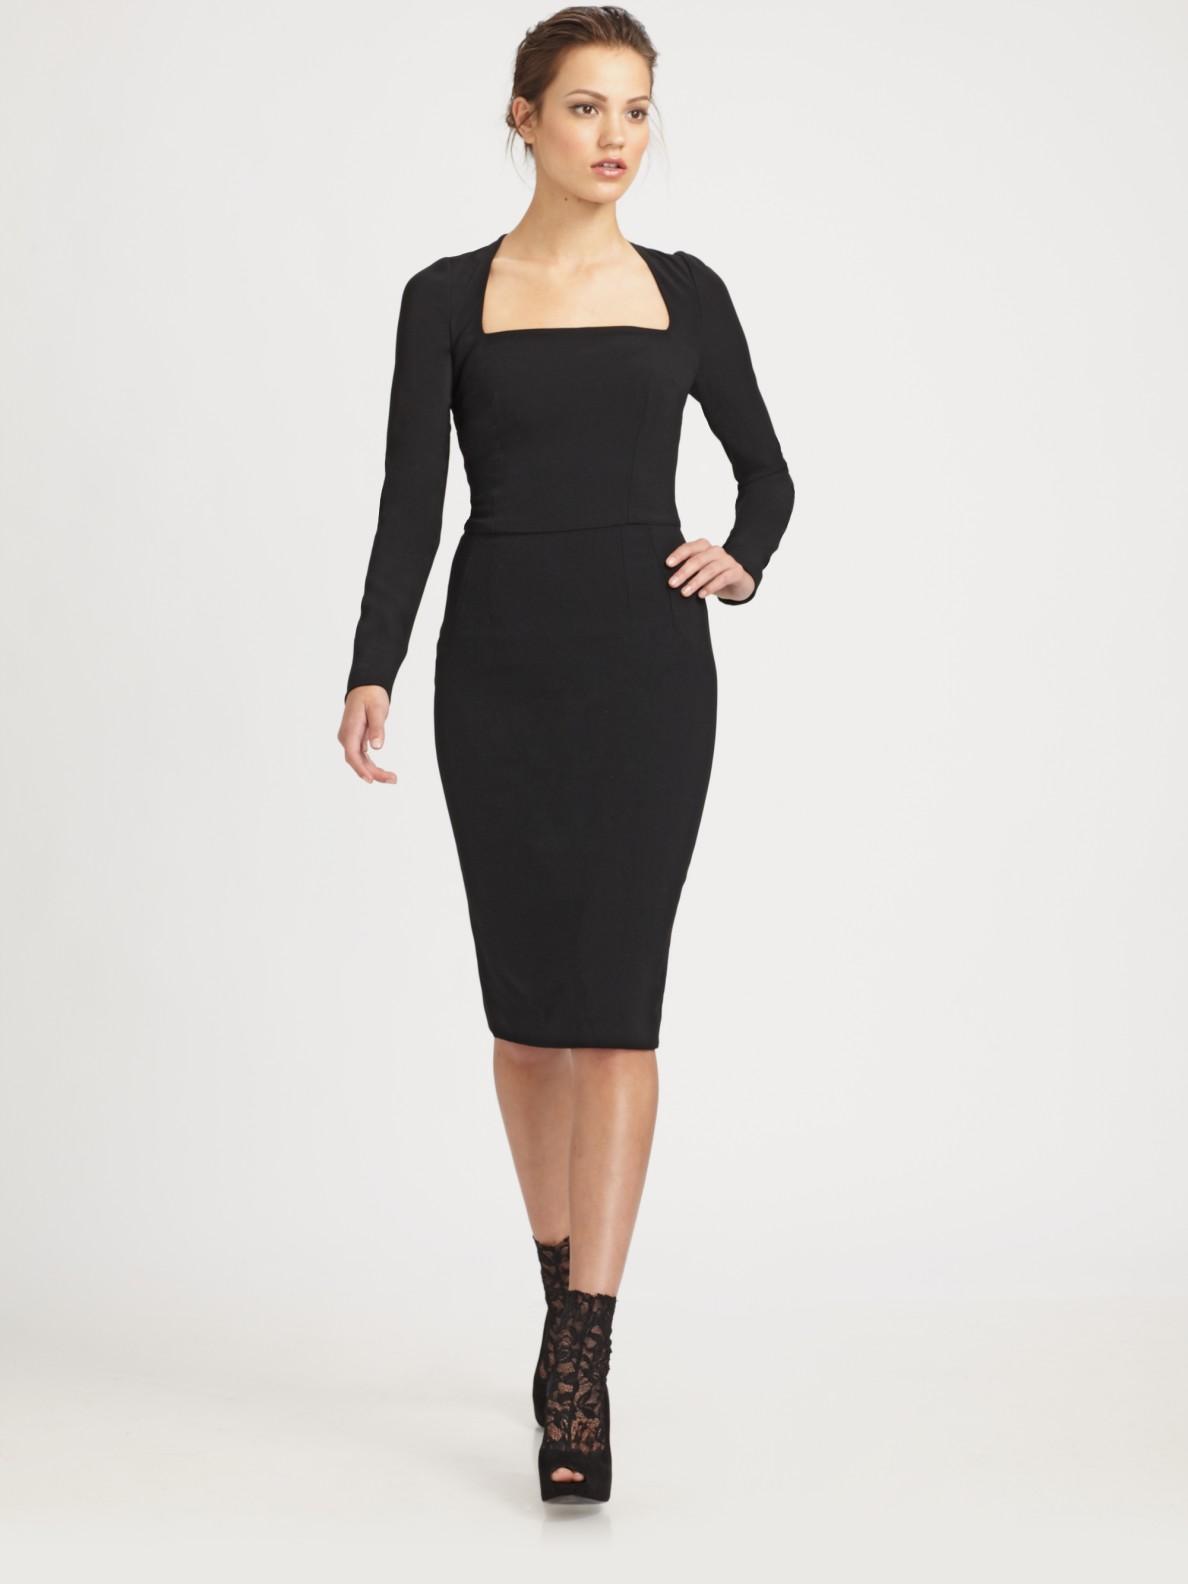 Dolce &amp- gabbana Square Neck Dress in Black - Lyst